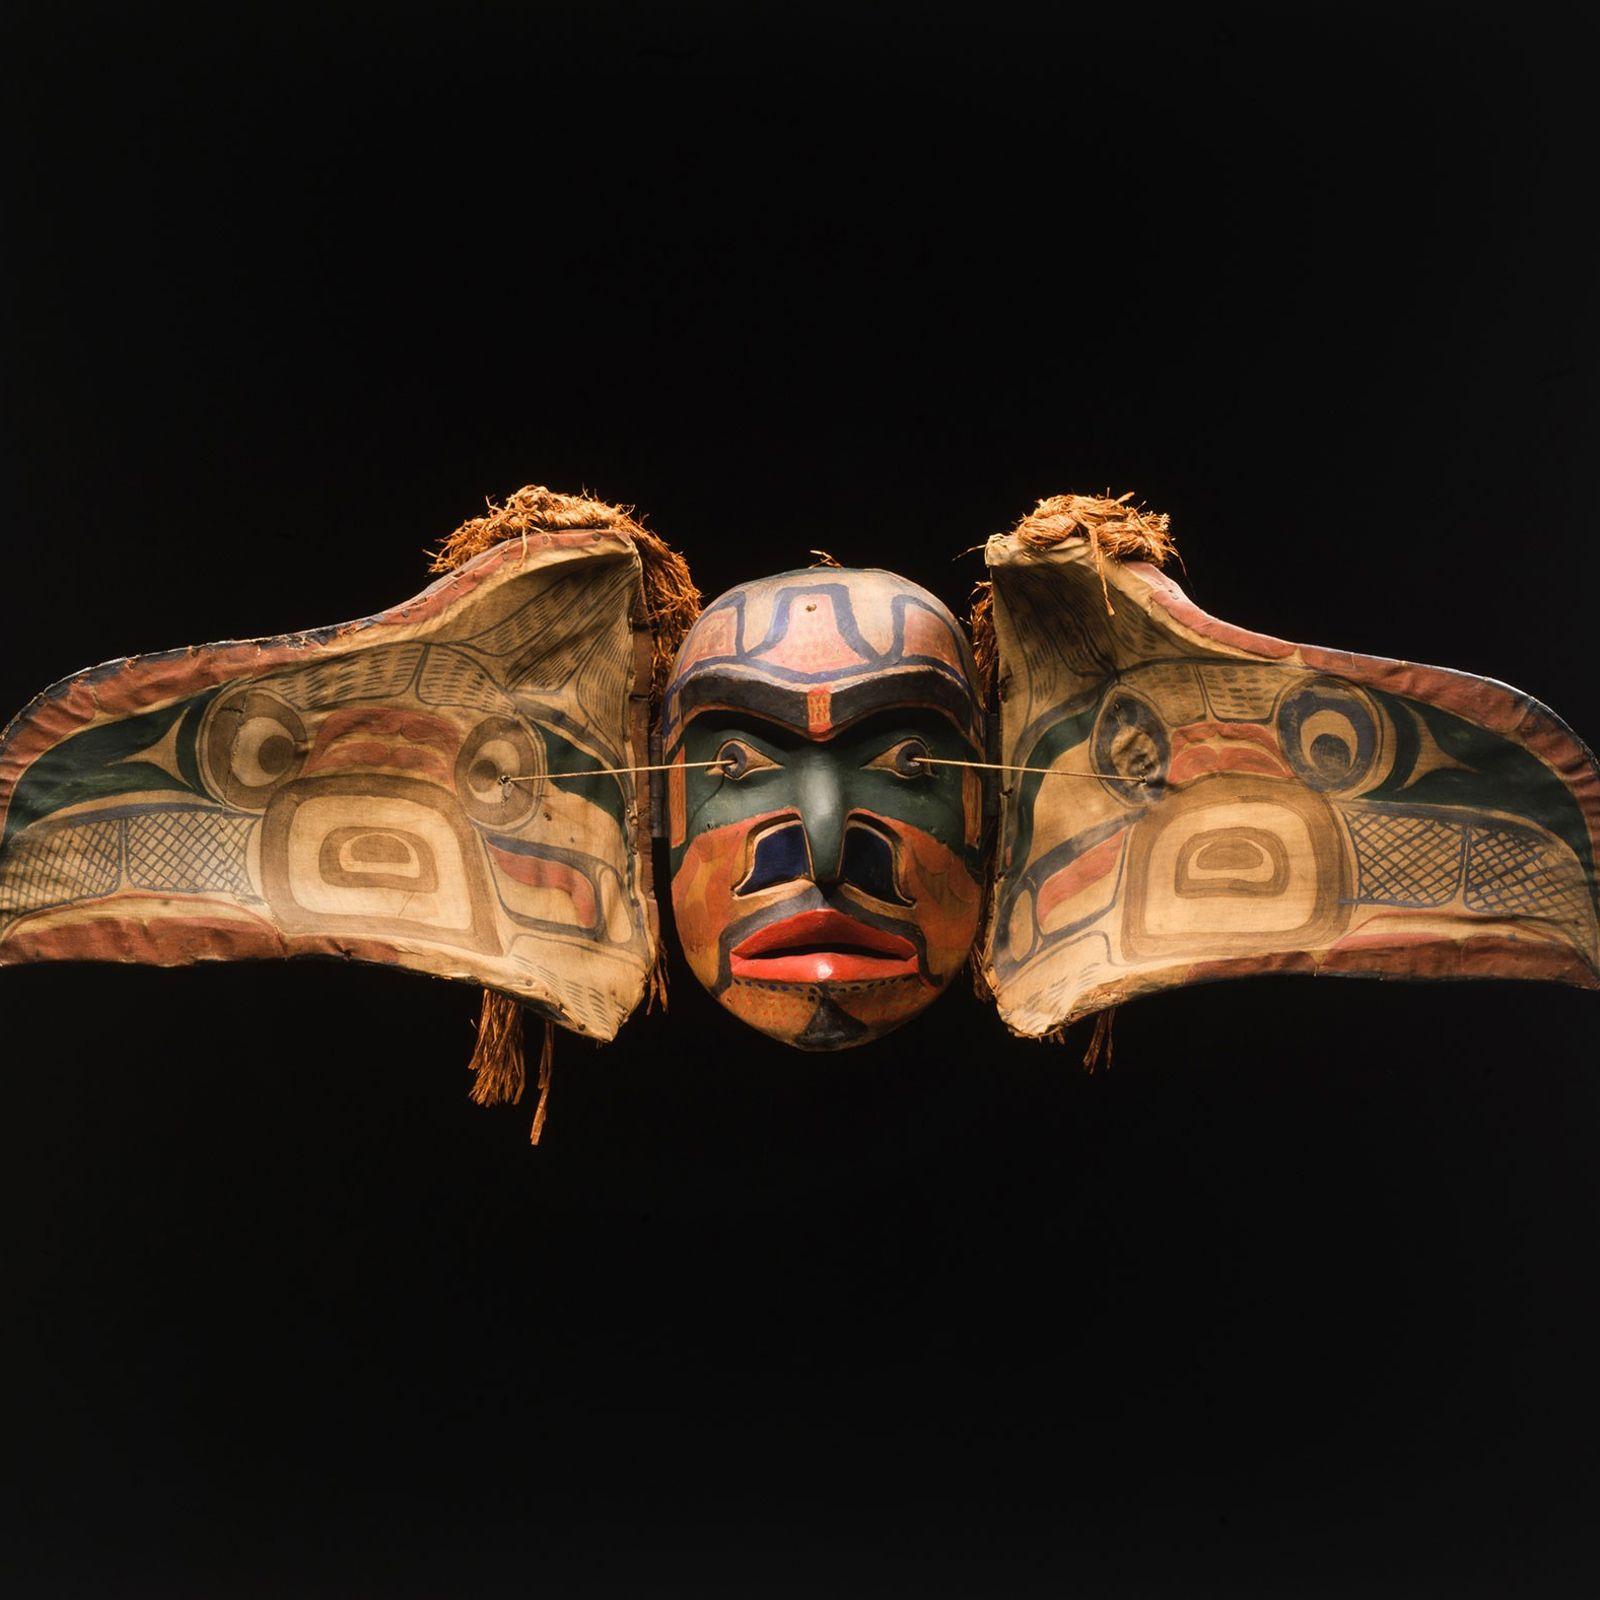 Transformation masks worn by the Kwakwaka'wakw people of British Columbia during potlatch ceremonies often represent the ...